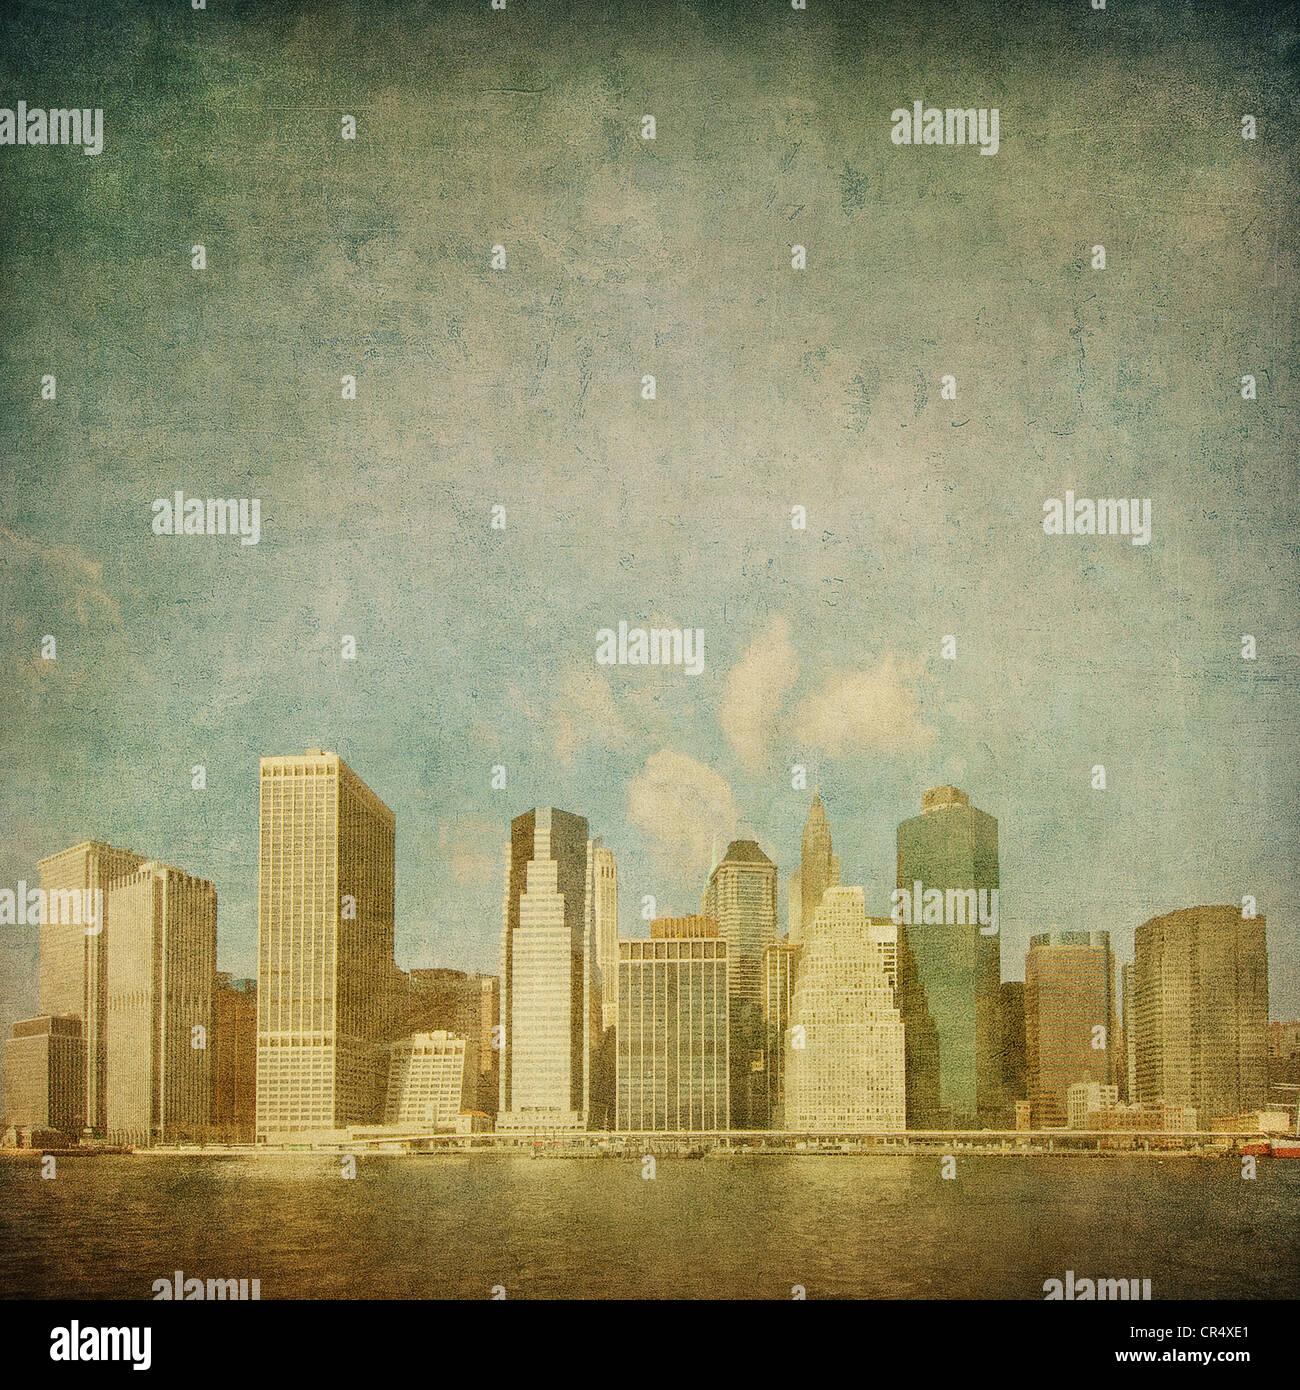 grunge image of new york skyline - Stock Image